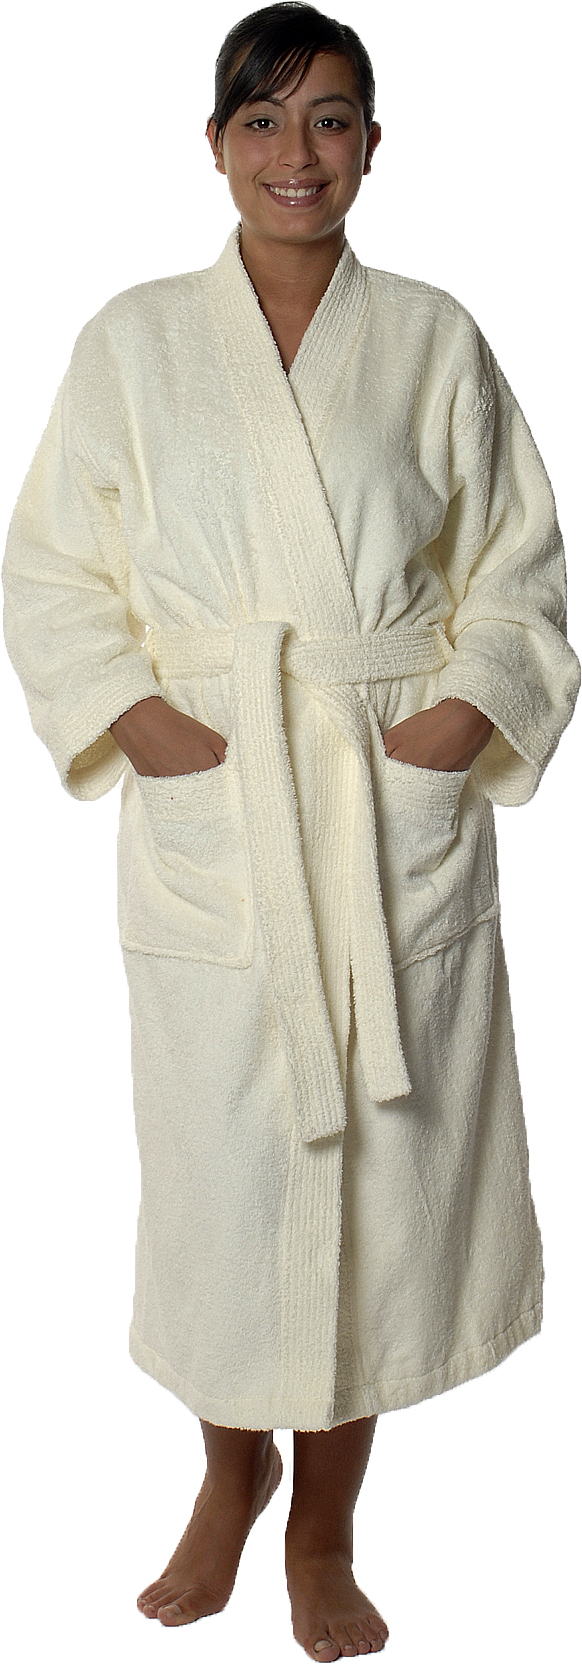 Peignoir col kimono en Coton couleur Ecru Taille L (Ecru)